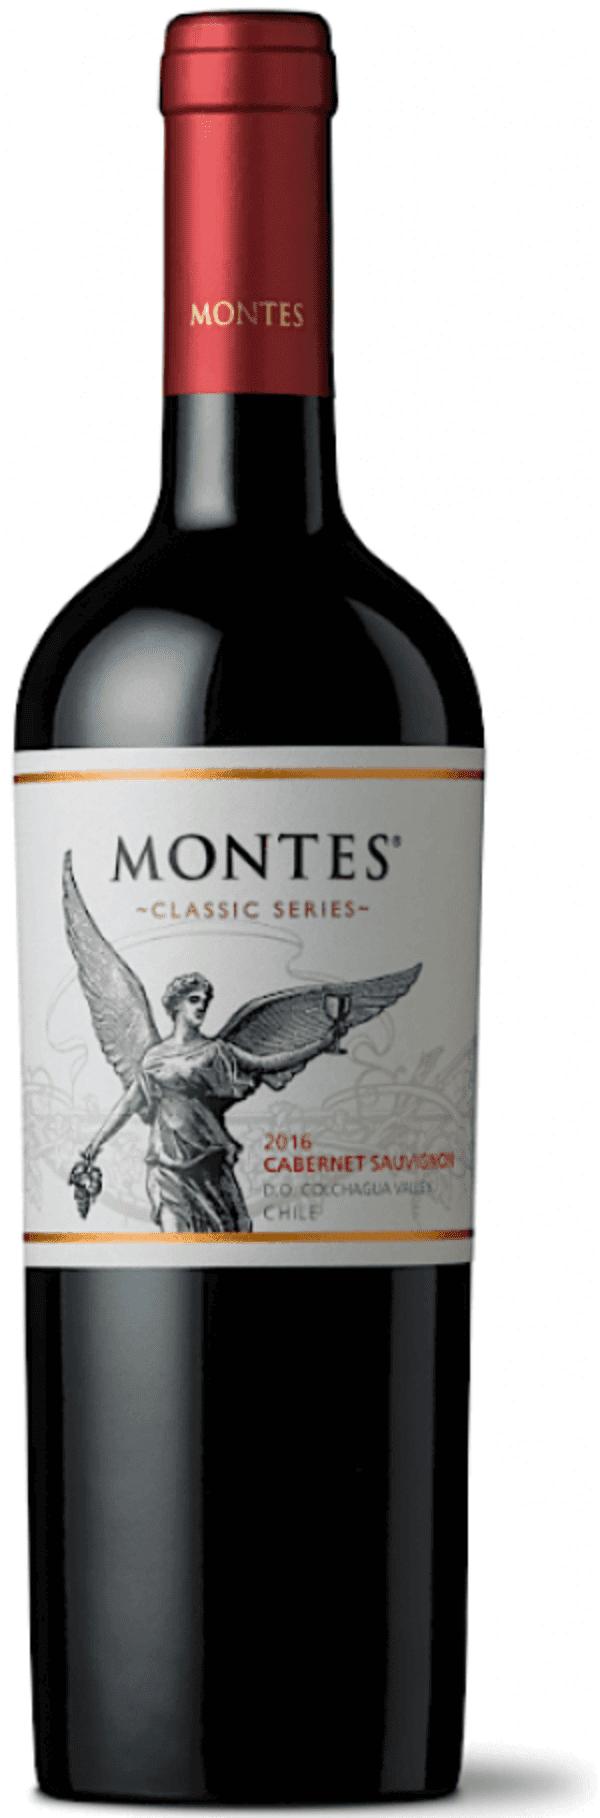 MONTES CABERNET SAUVIGNON RESERVA 2016 (TTO) (VINA MONTES)